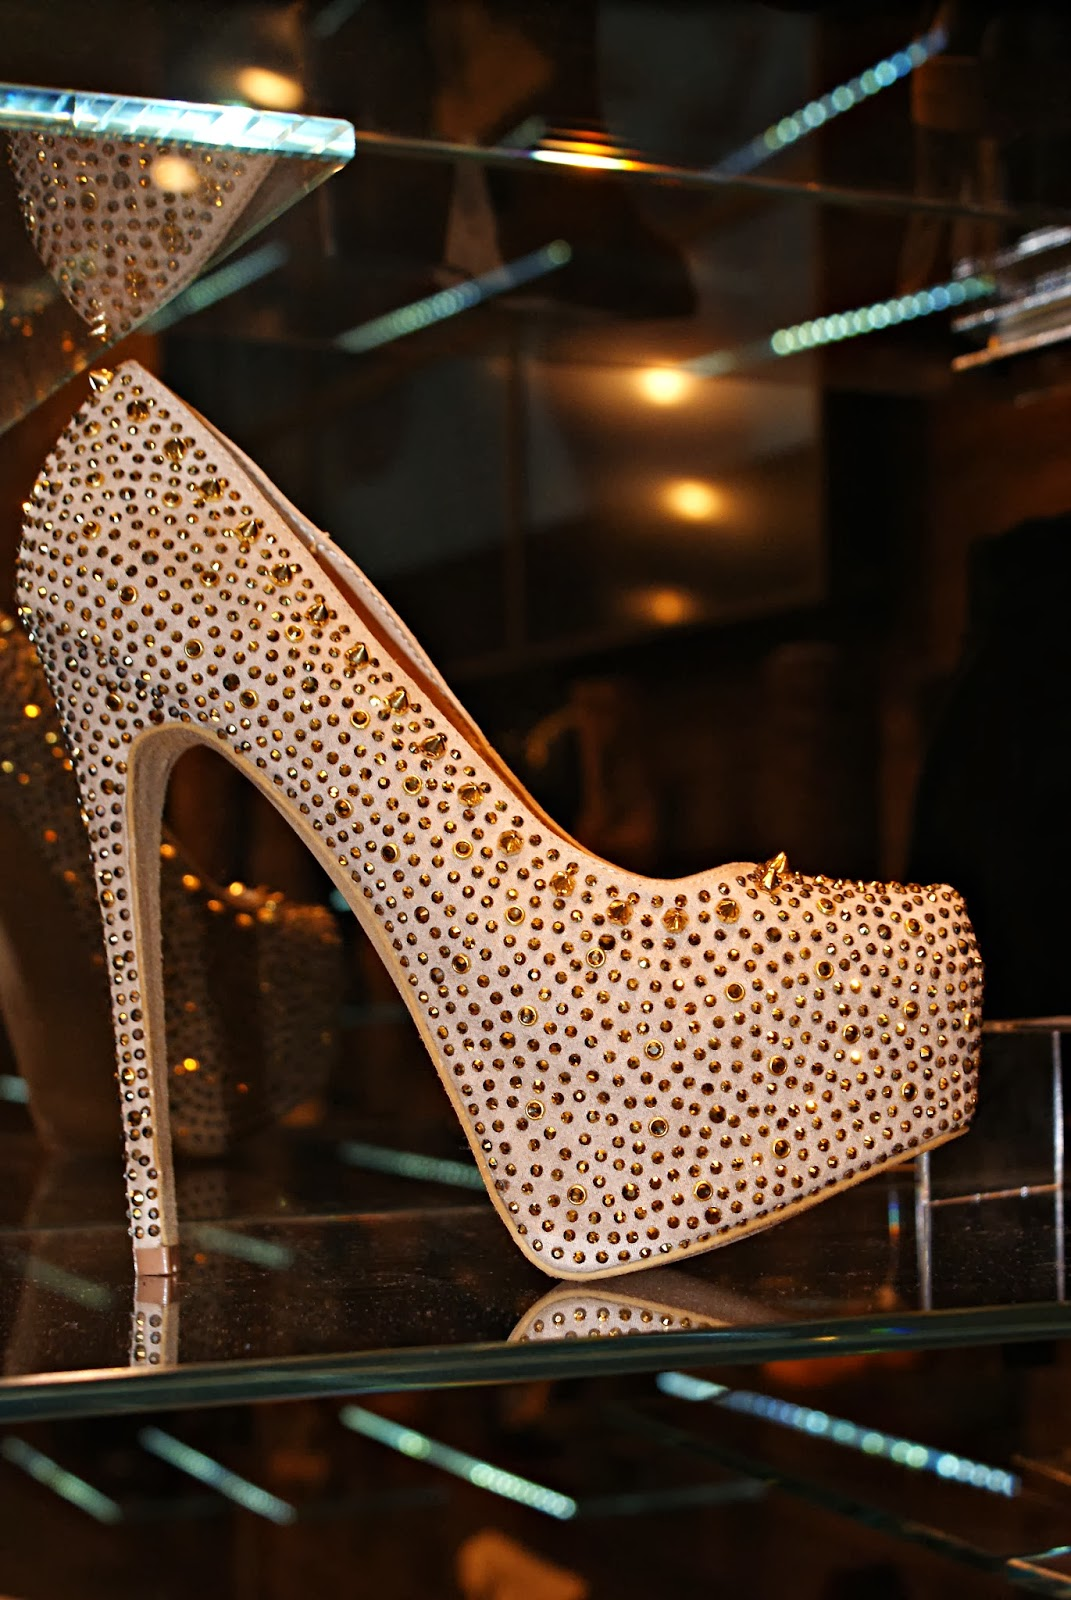 Подарок хрустальная туфелька